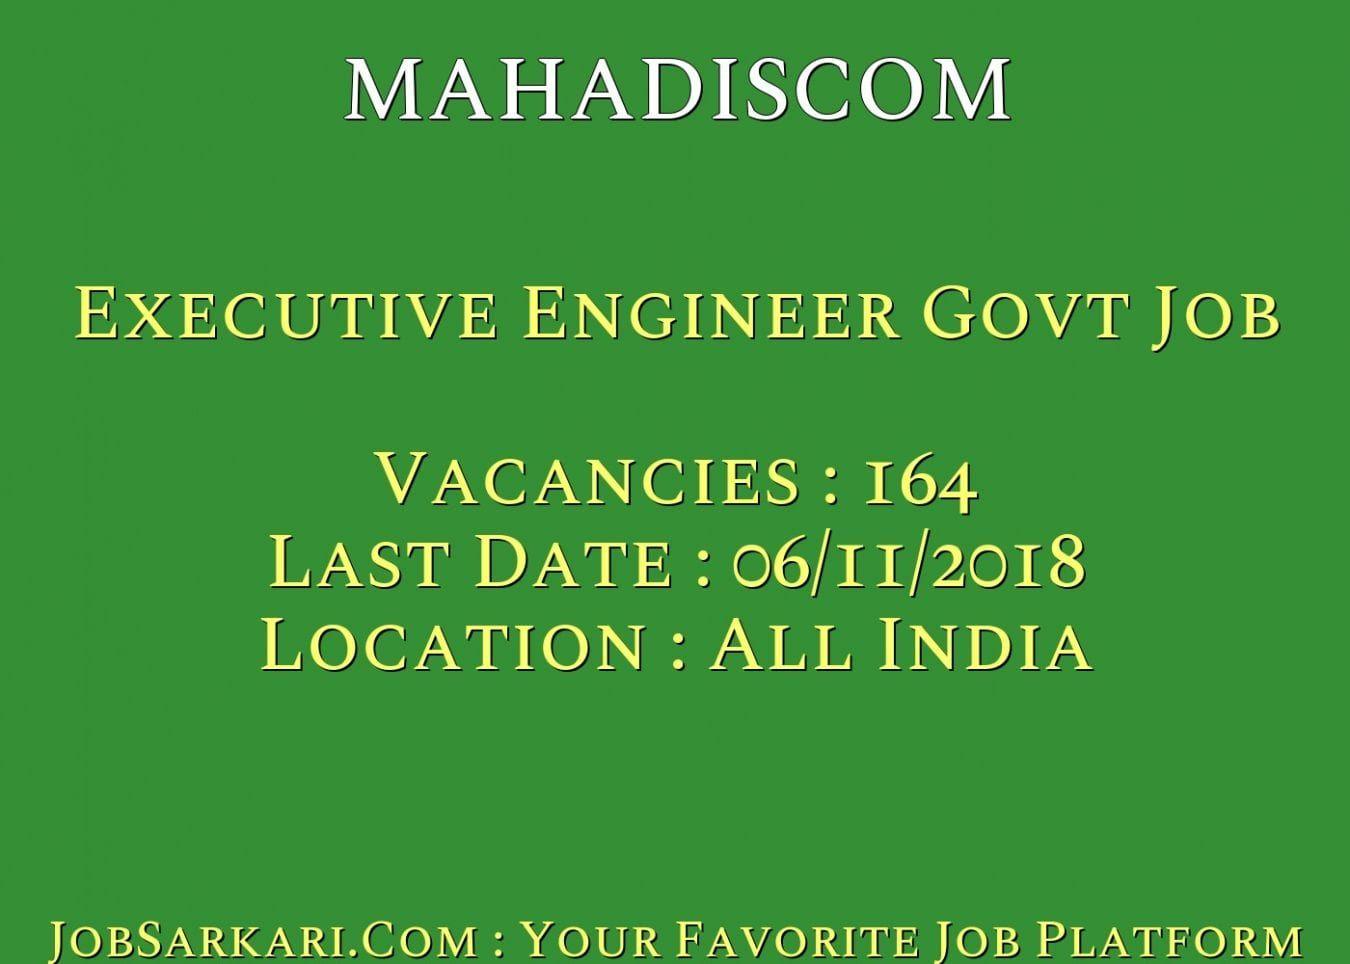 Recruitment 2018 For Executive Engineer Govt